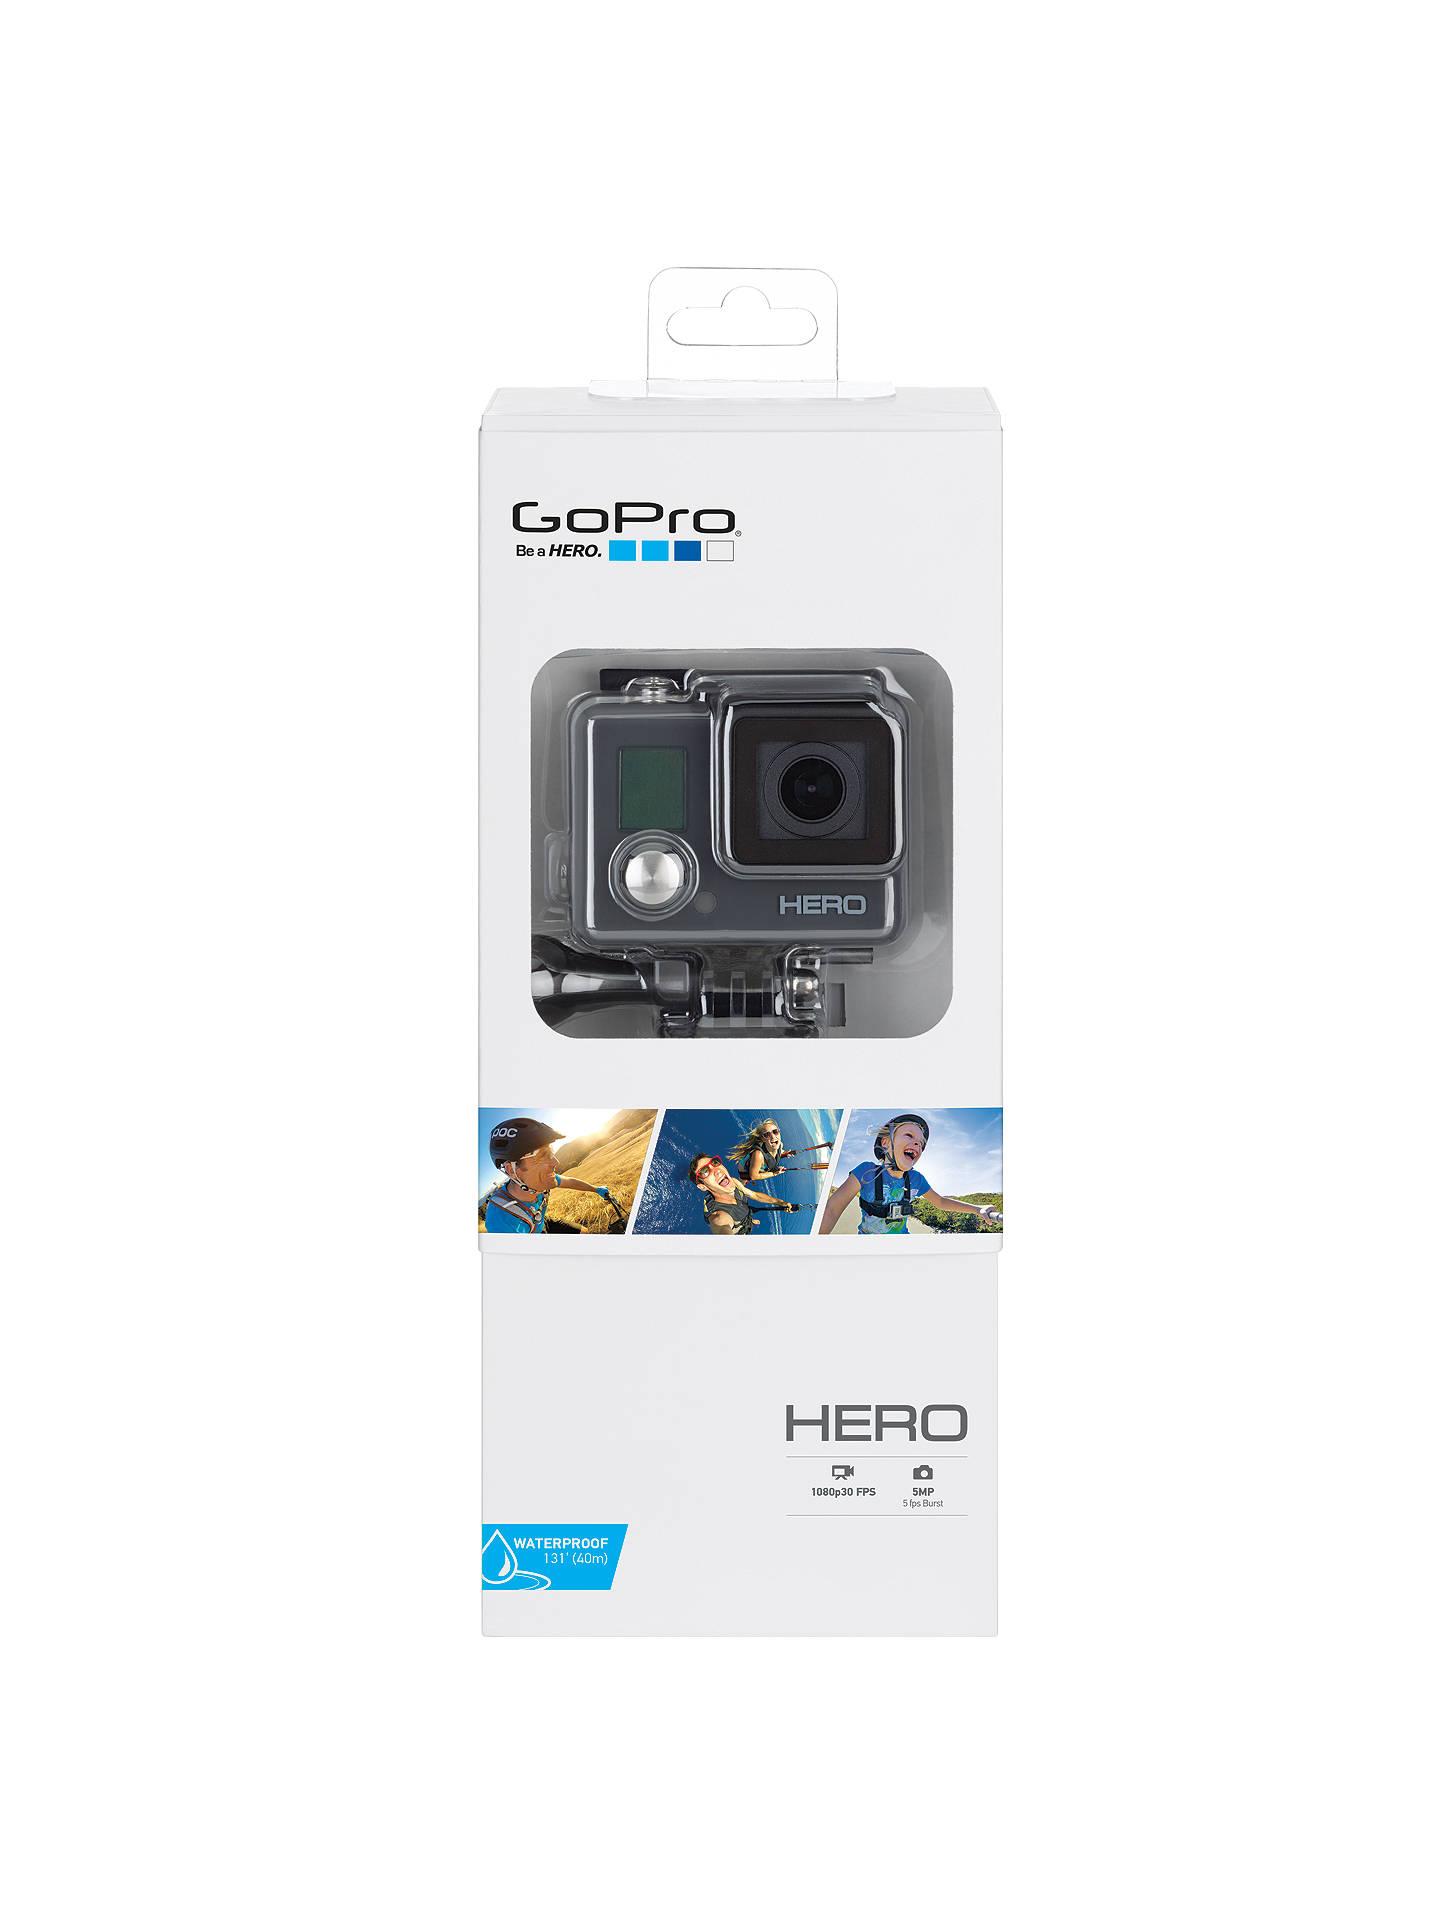 GoPro Hero Waterproof Camcorder, HD 1080p, 5MP at John Lewis & Partners